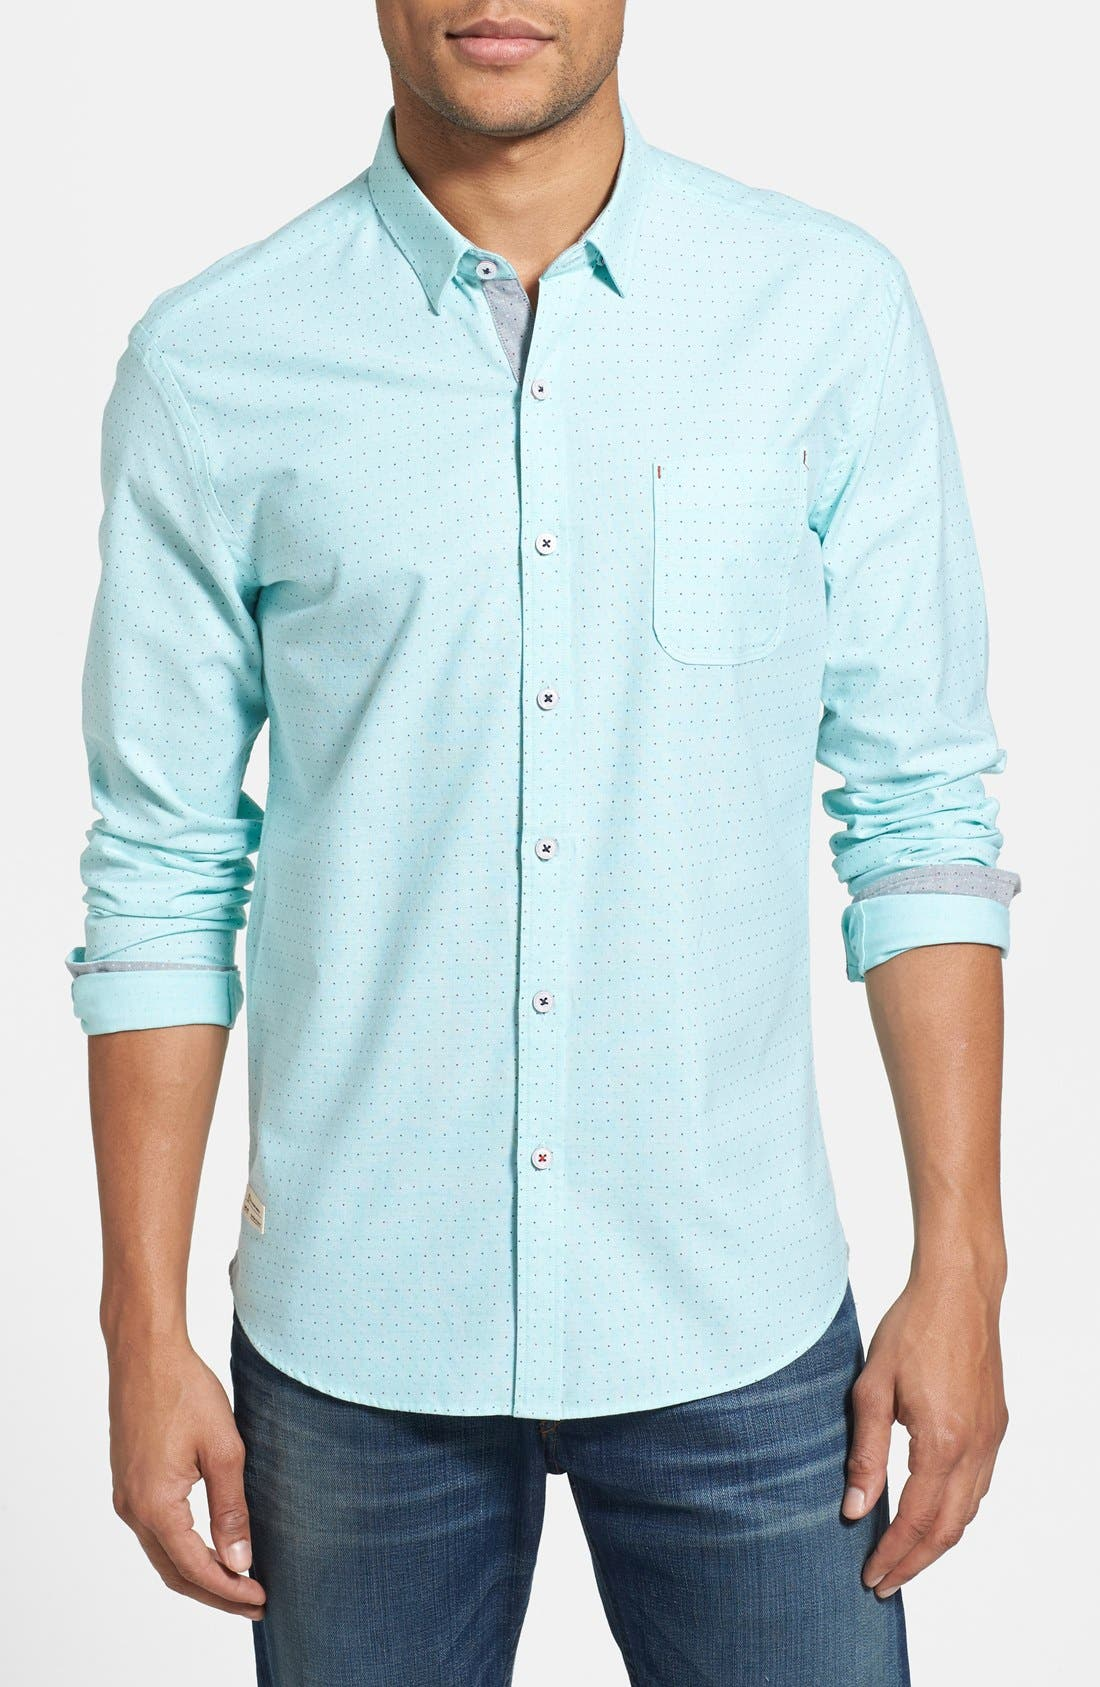 Main Image - 7 Diamonds 'Mint Condition' Dot Print Sport Shirt